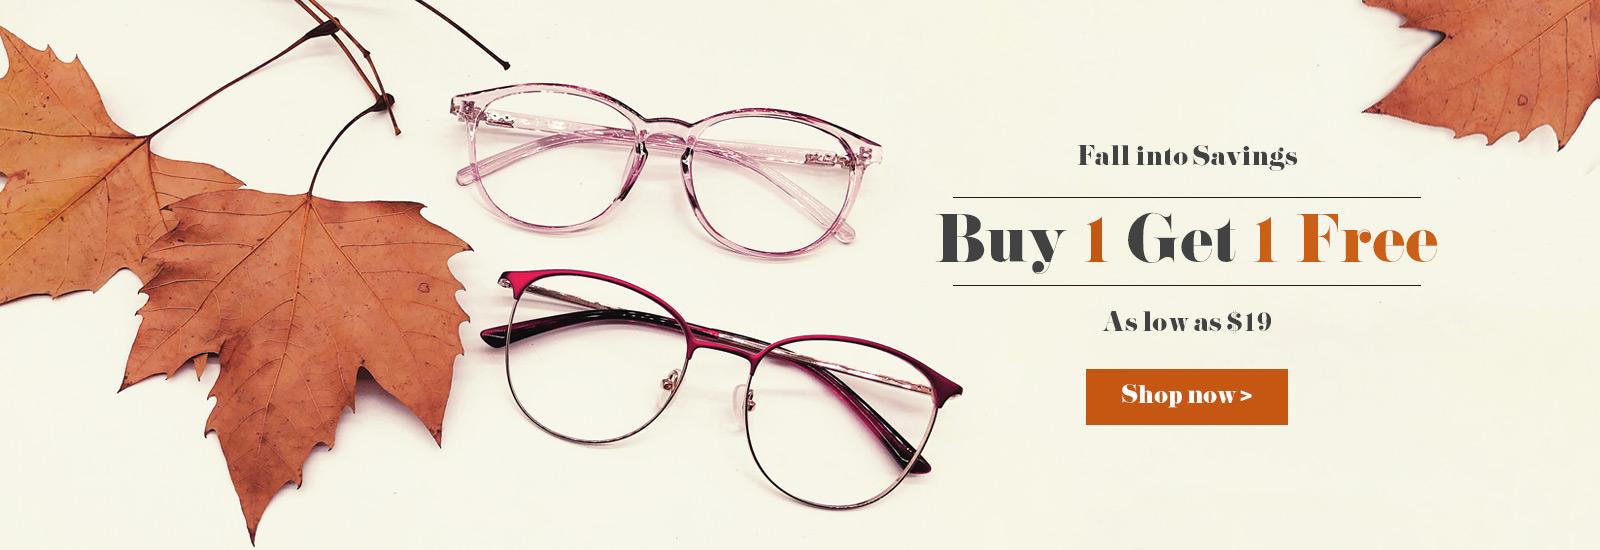 your preferred online eyewear store firmoocom glassessunglassesprescription eyeglassesreading glasses - Eyeglasses Online Store